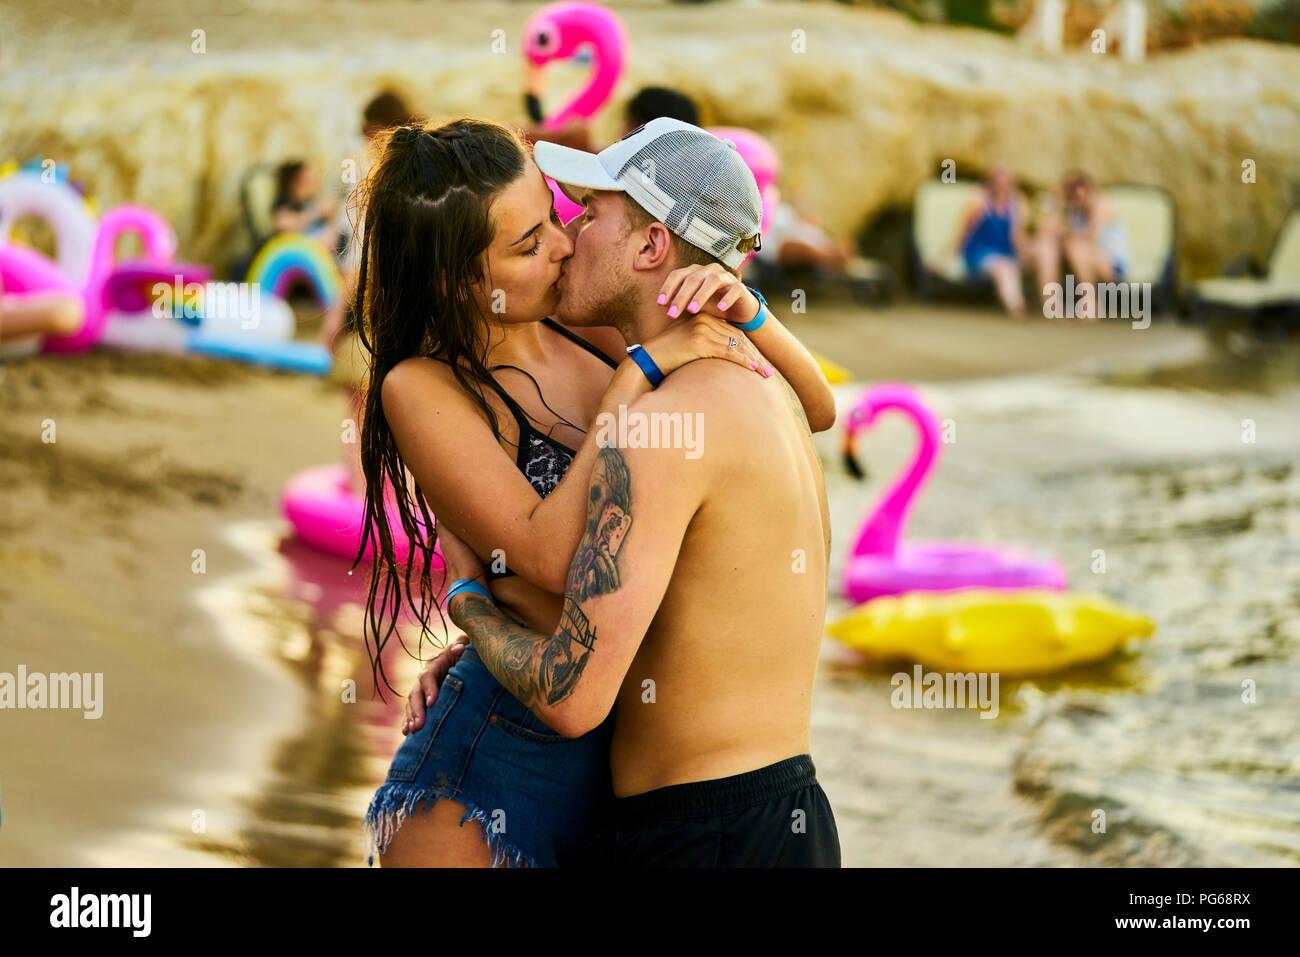 Griechenland, Kreta, leidenschaftlich Geliebte an Beach Party küssen Stockbild